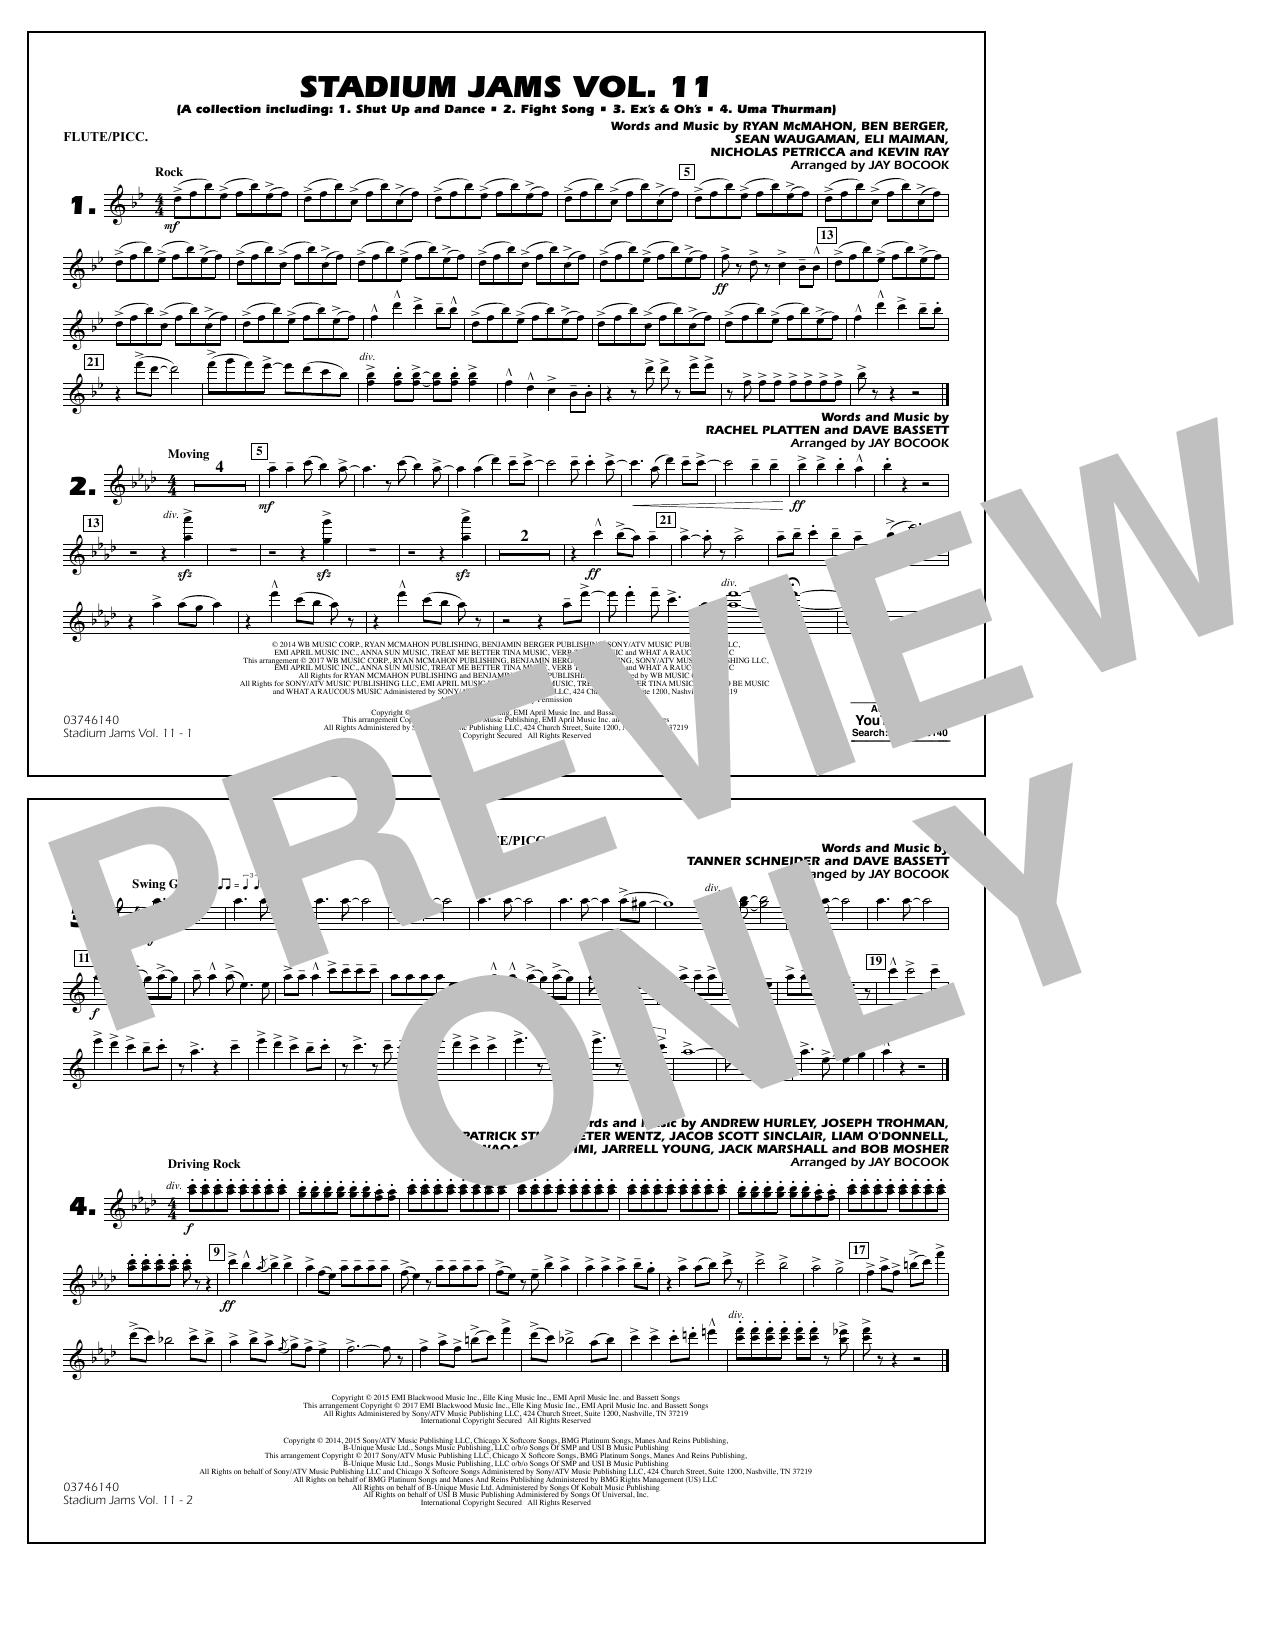 Stadium Jams Volume 11 - Flute/Piccolo Partition Digitale